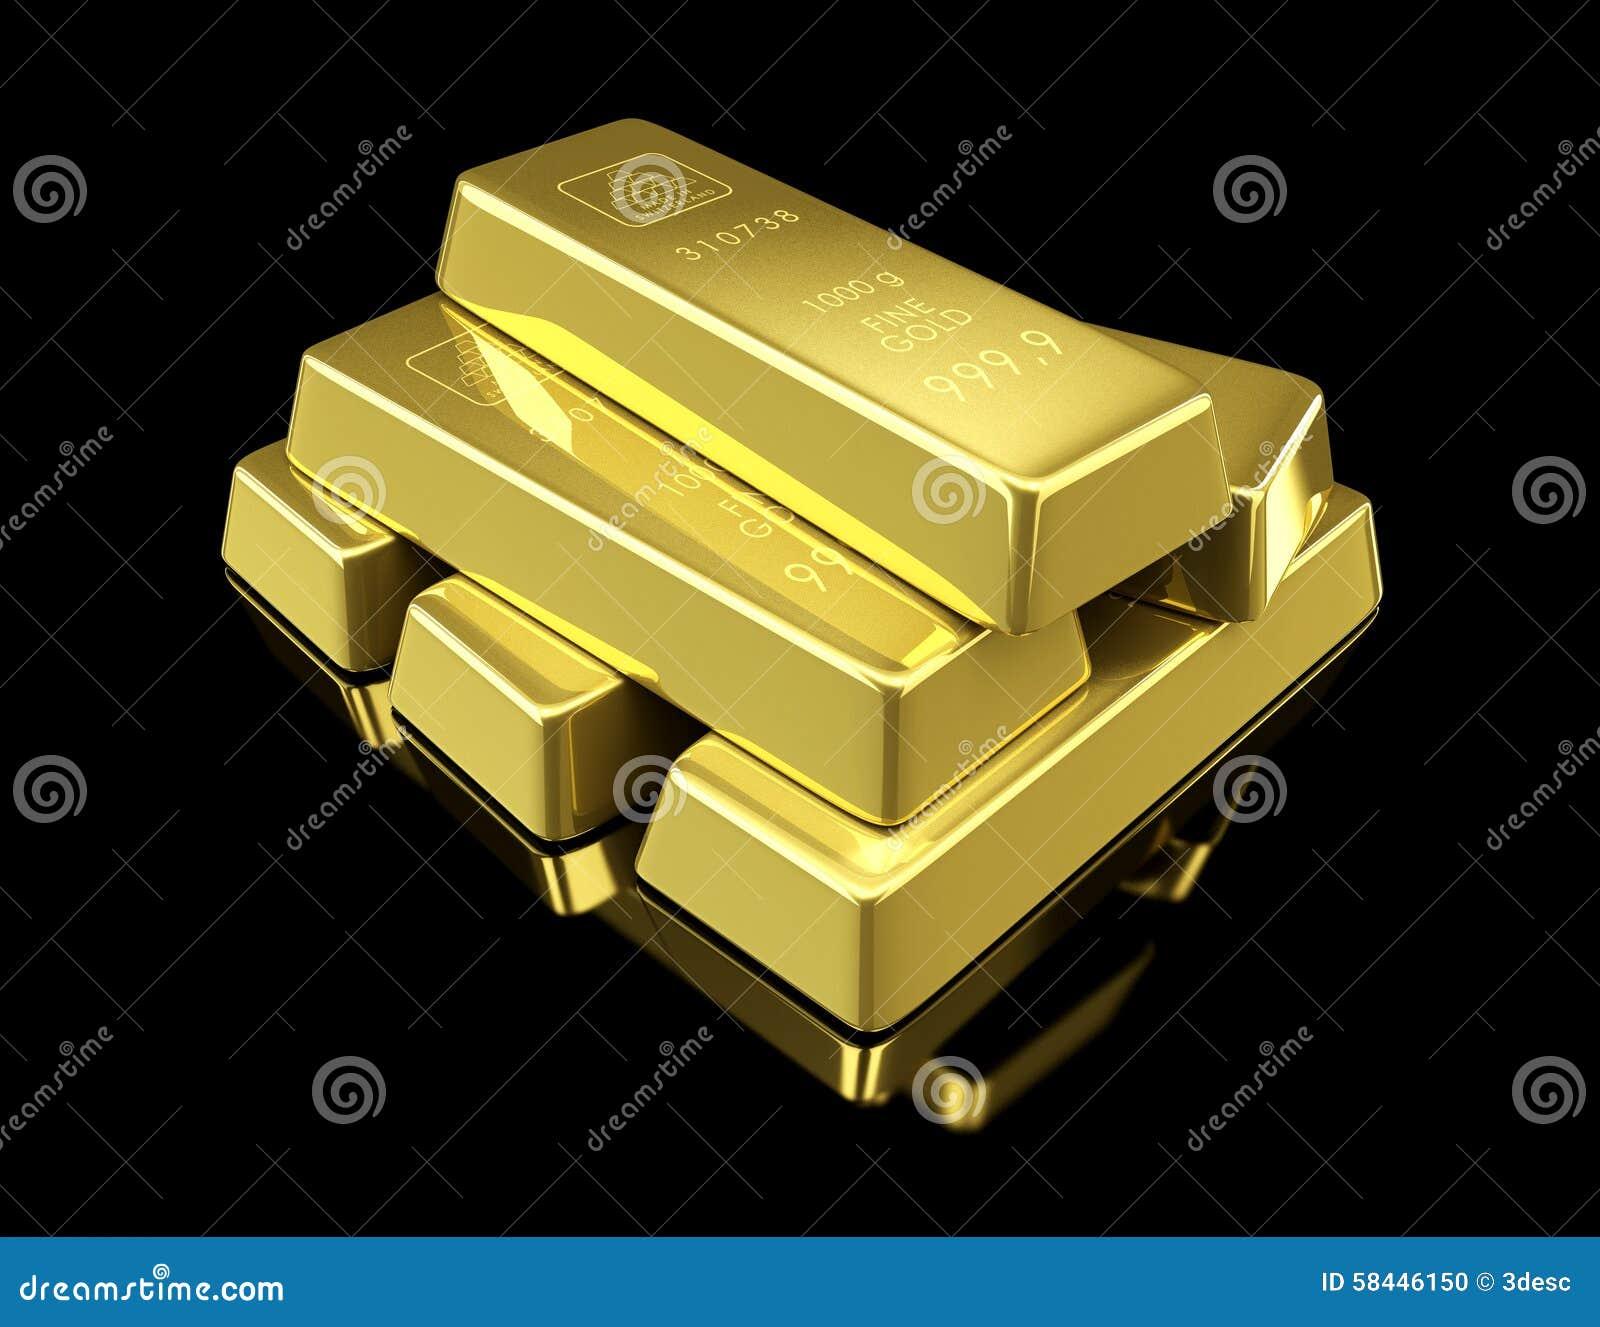 gold bar black background - photo #14